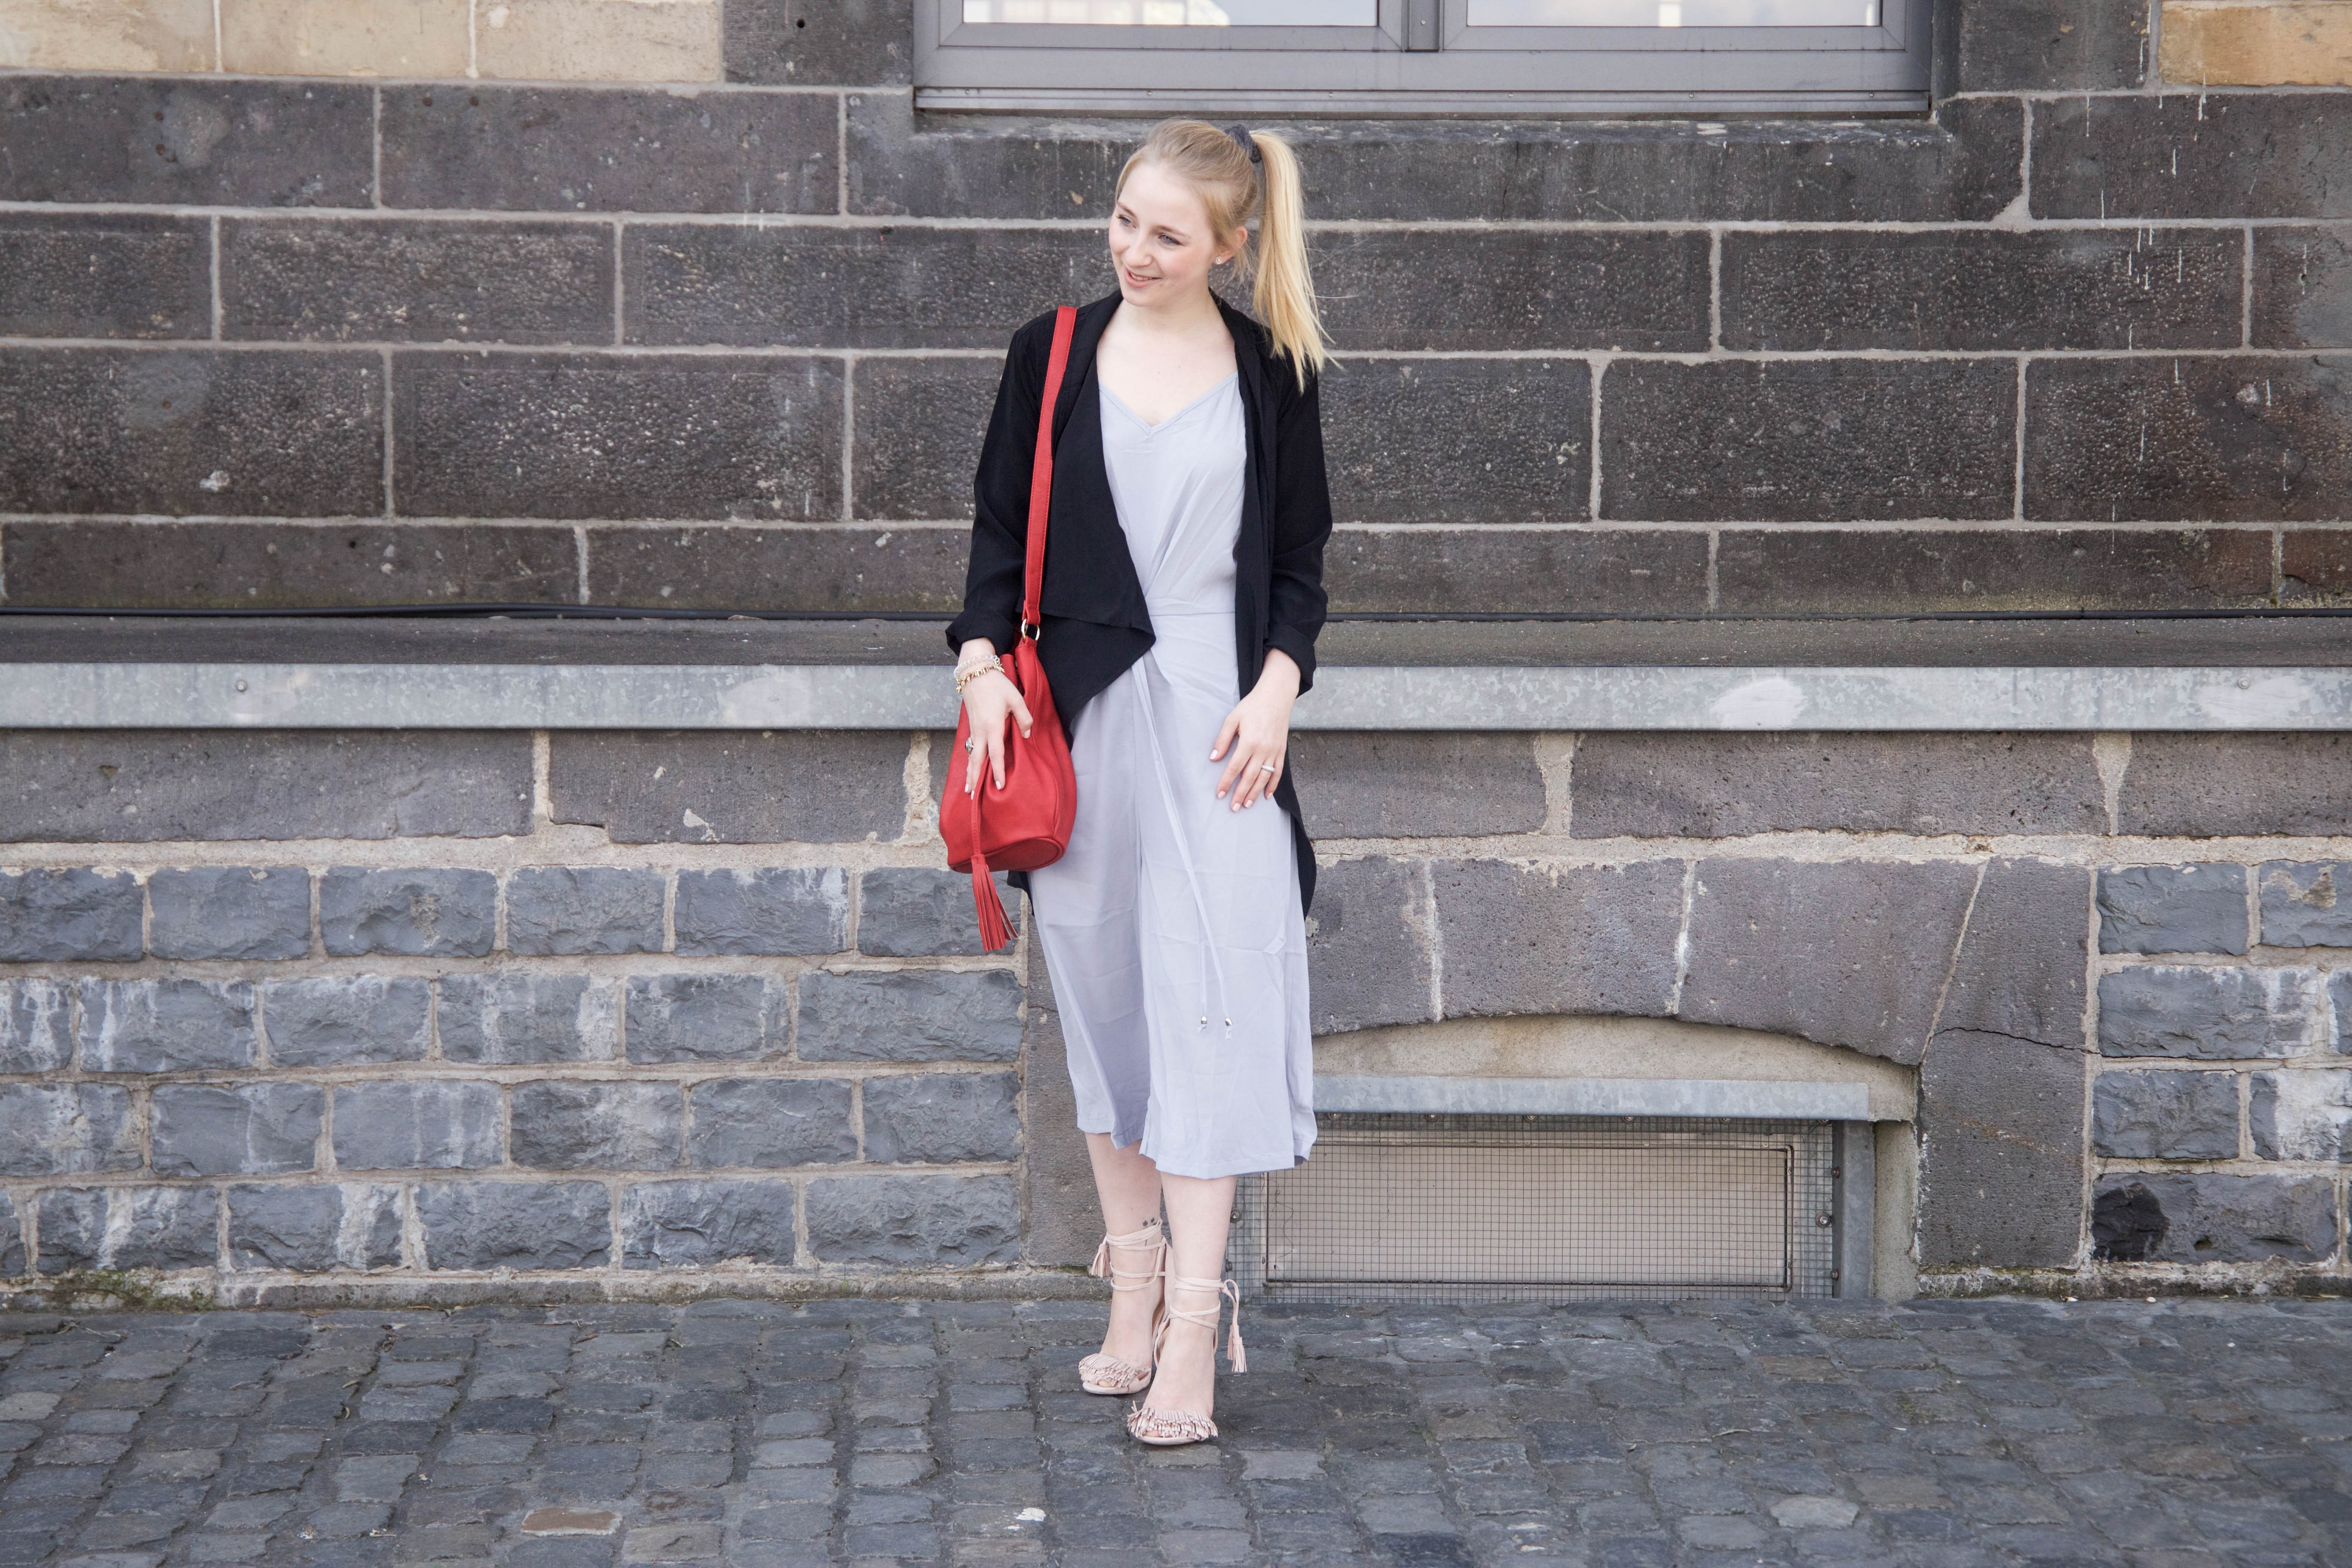 justfab modeblog berlin köln ootd fashion outfit jumpsuit overall_9832